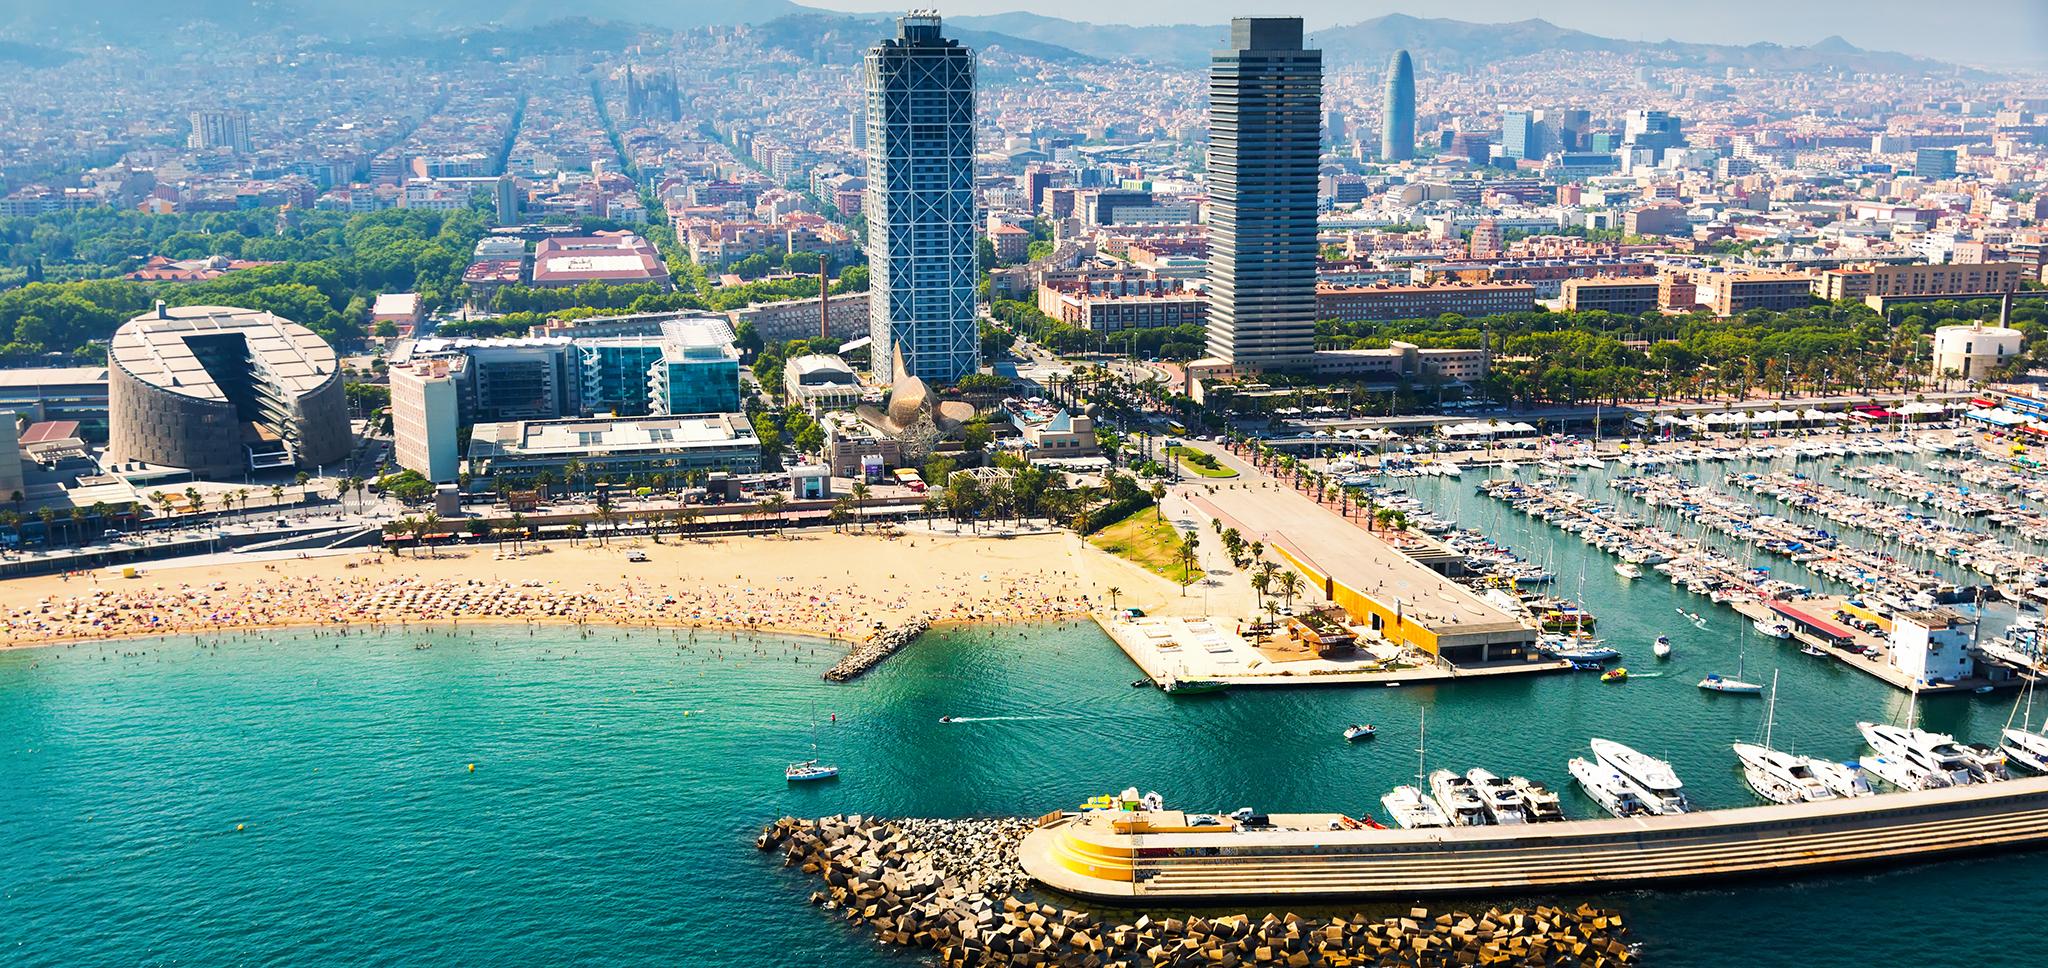 Contacto, Barcelona